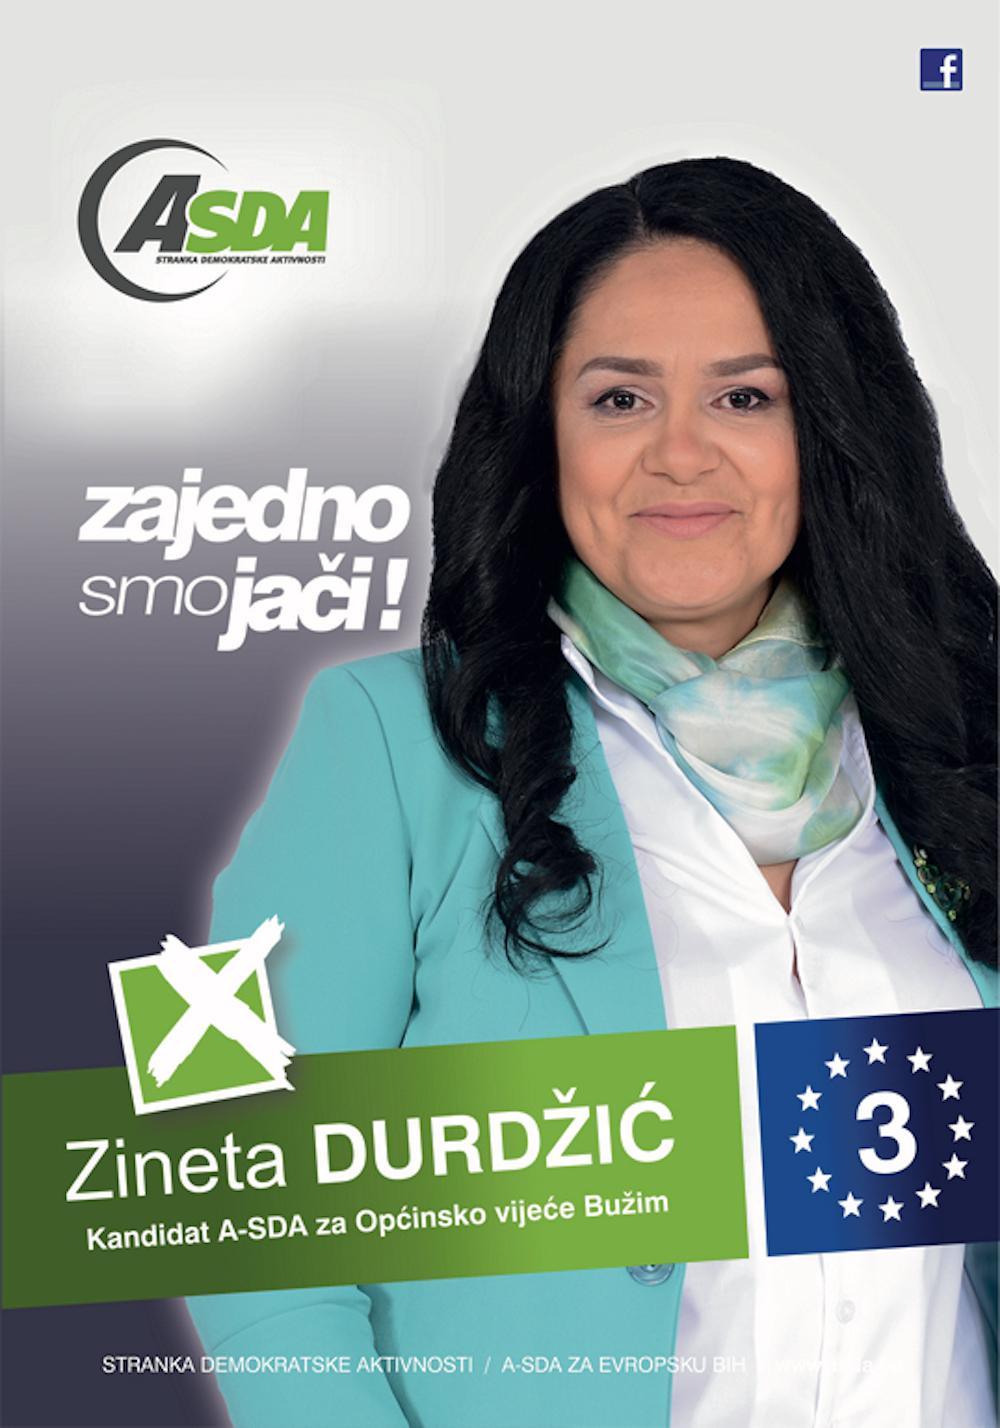 Zineta Durdžić